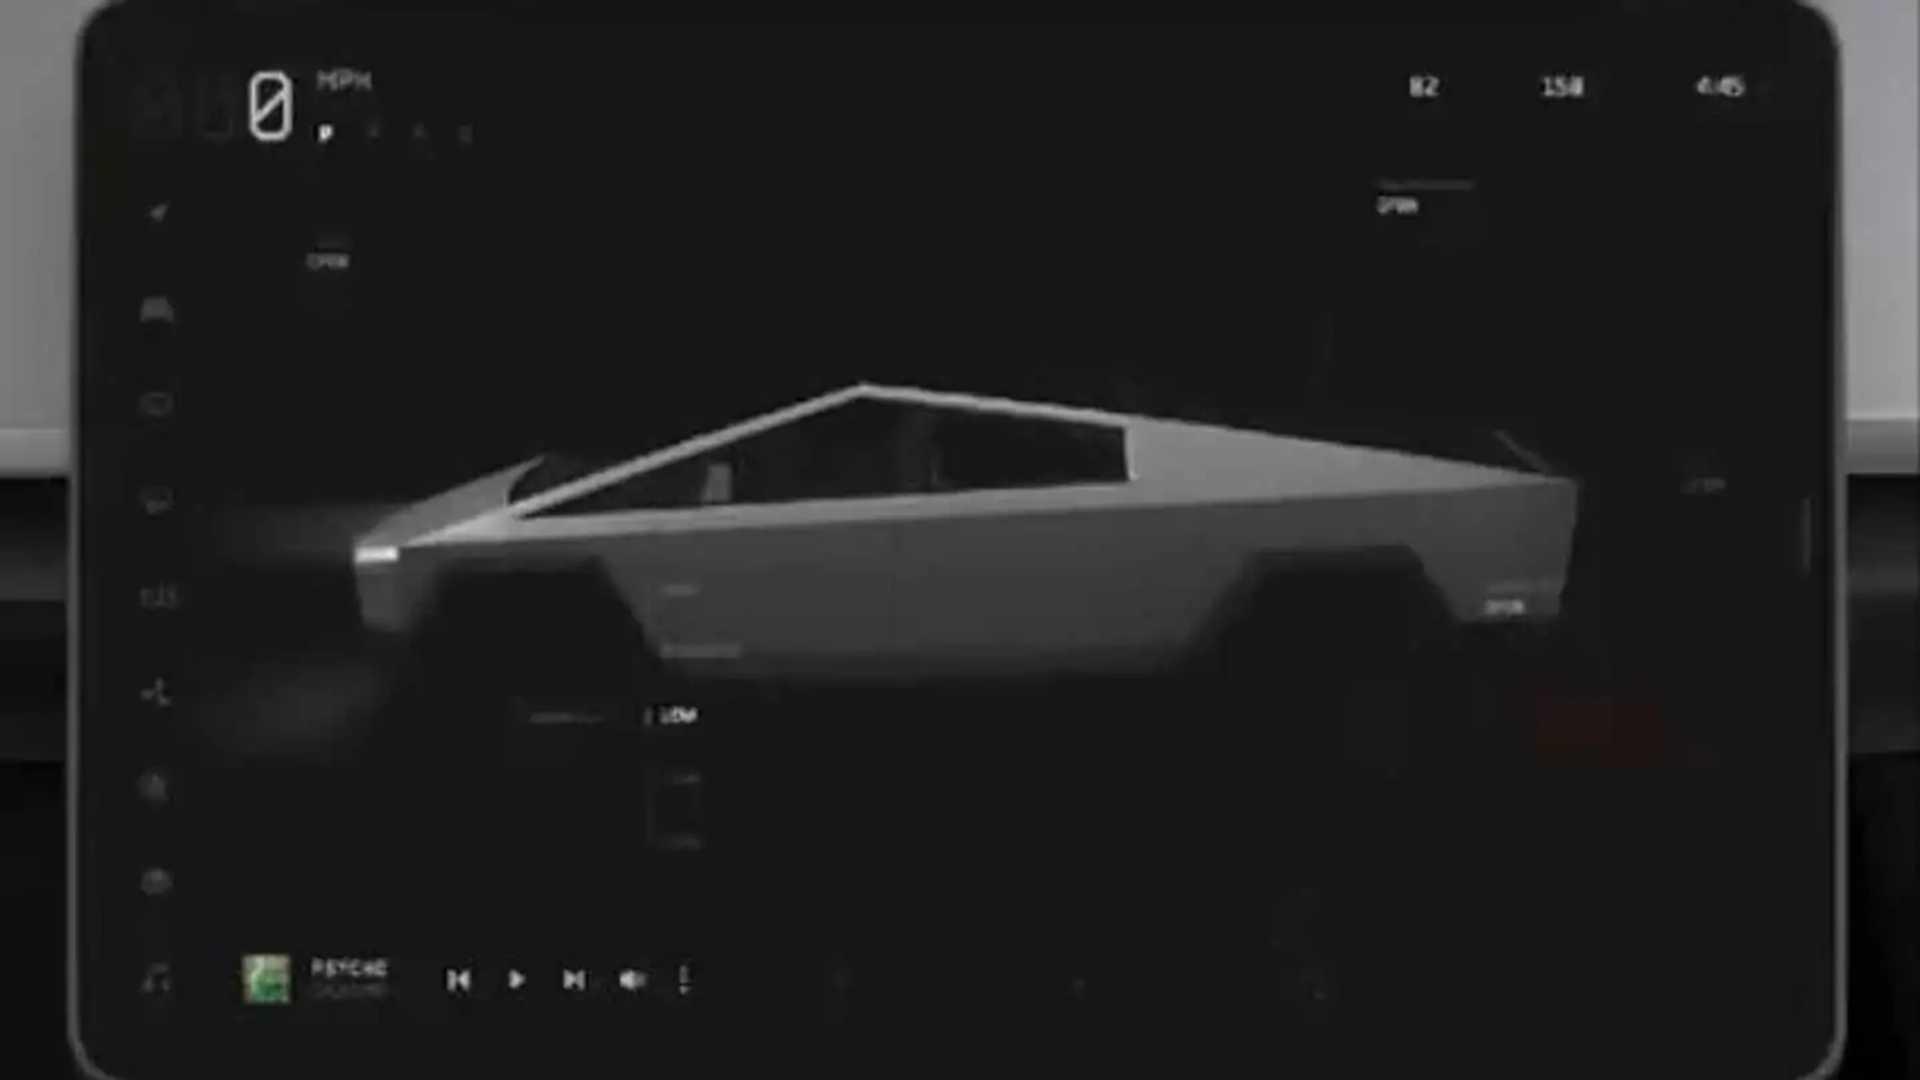 A Former Tesla Designer Shared The Cybertruck's UI Design